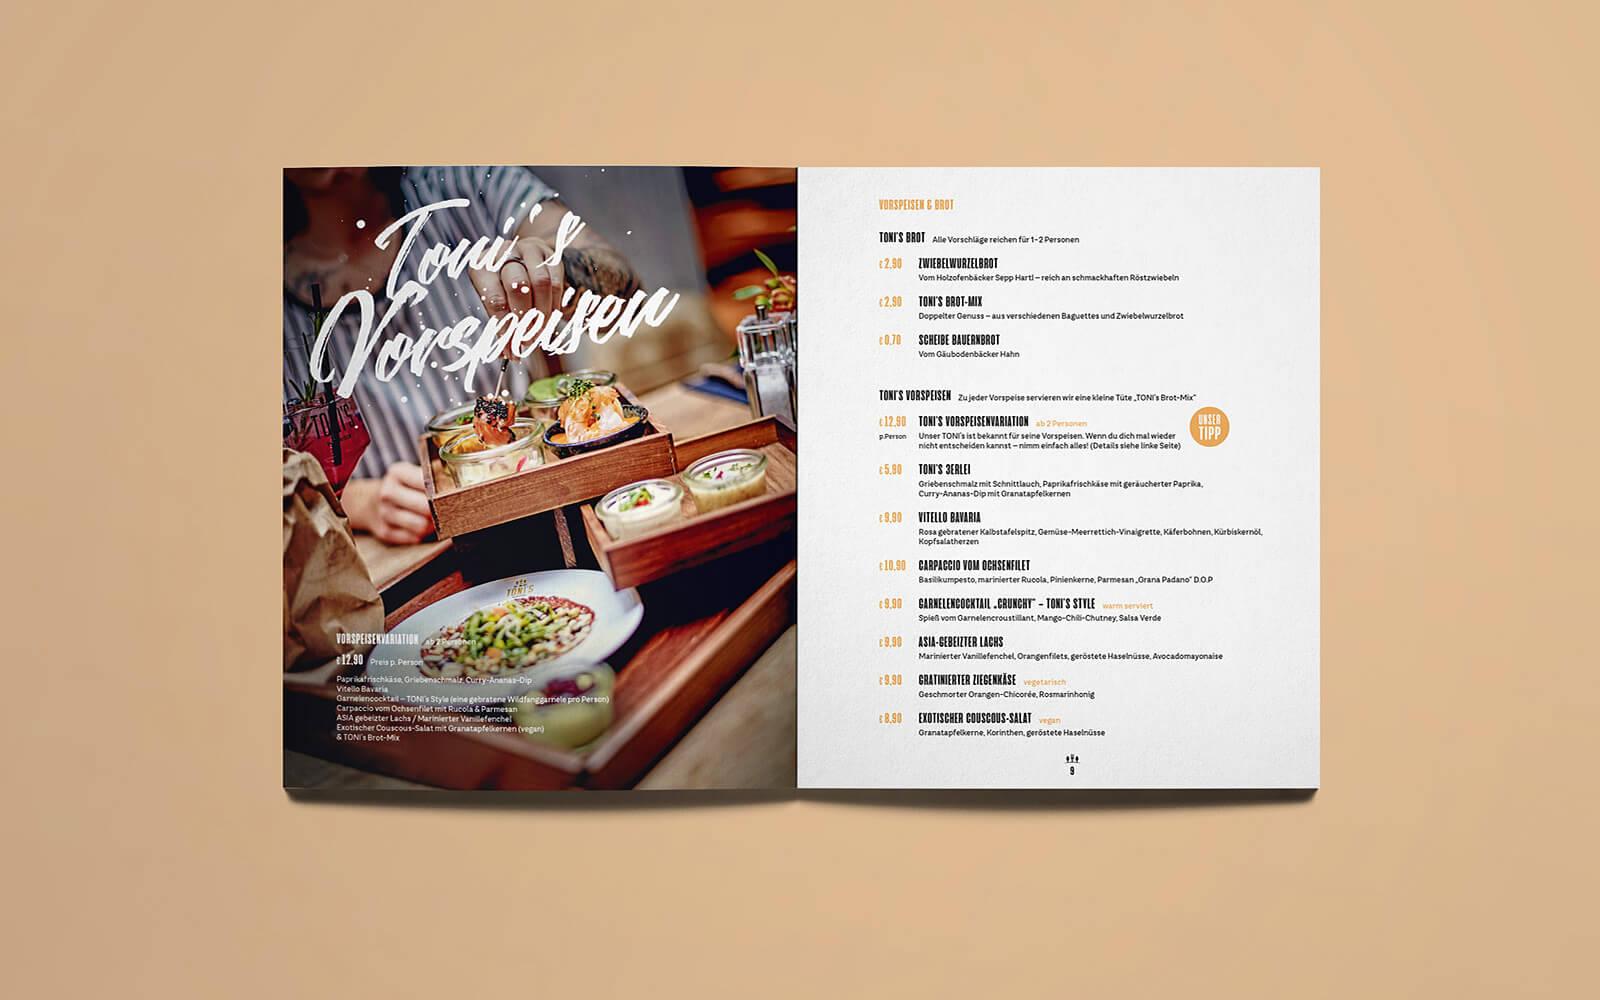 TONI's Speisekarte – Vorspeisen